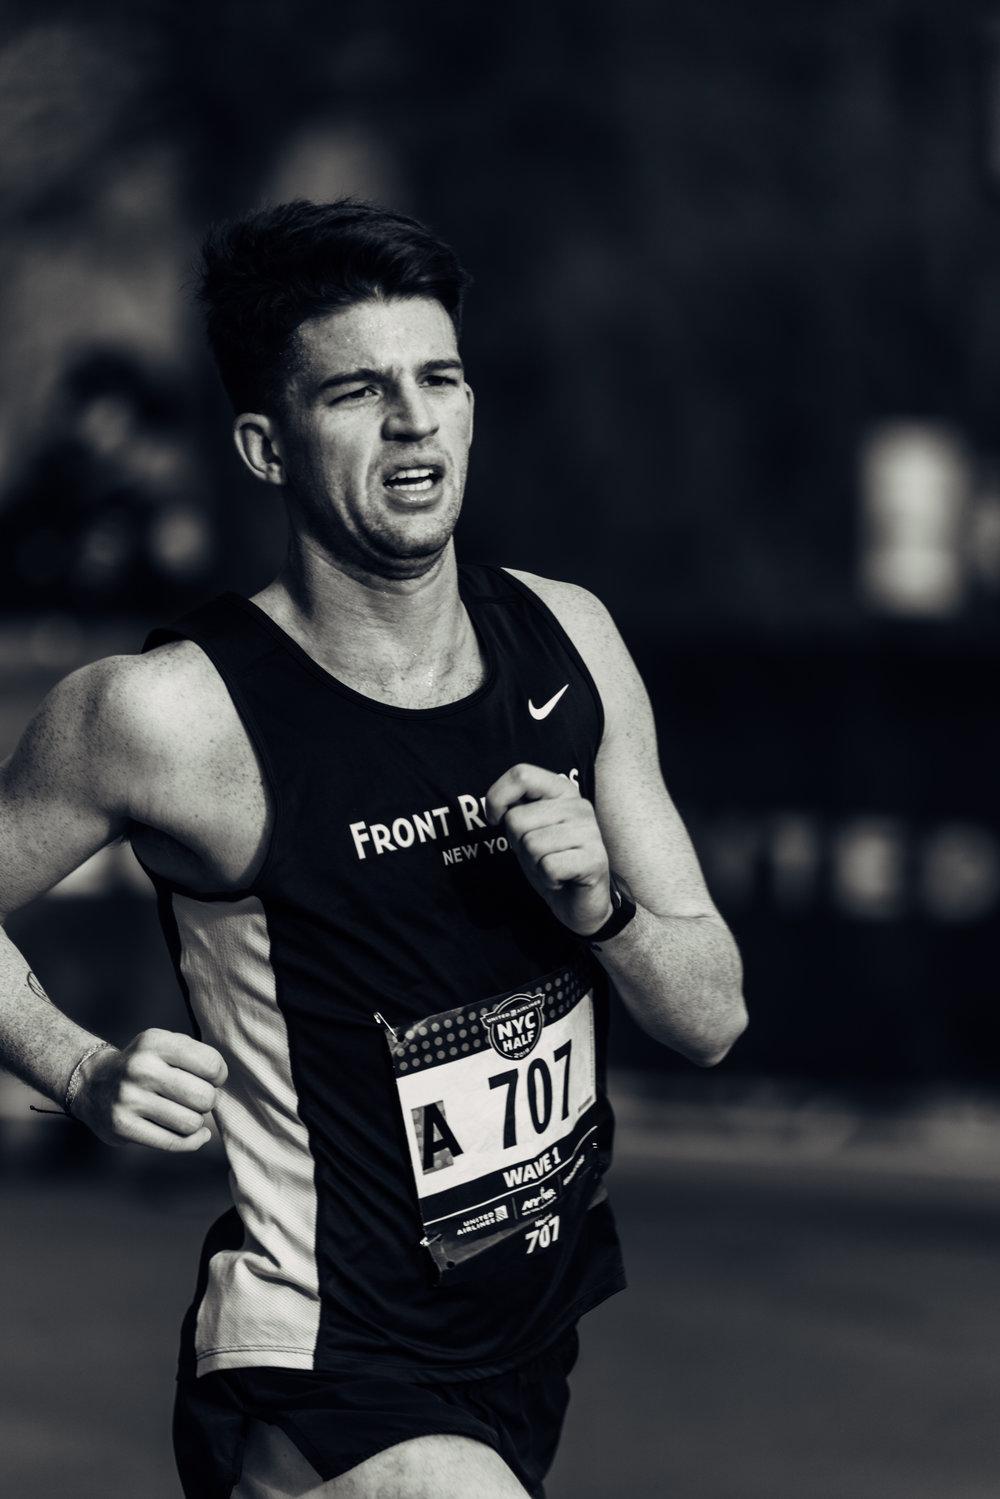 Photo Rhetoric - To Be Determined - United NYC Half Marathon-3017.jpg